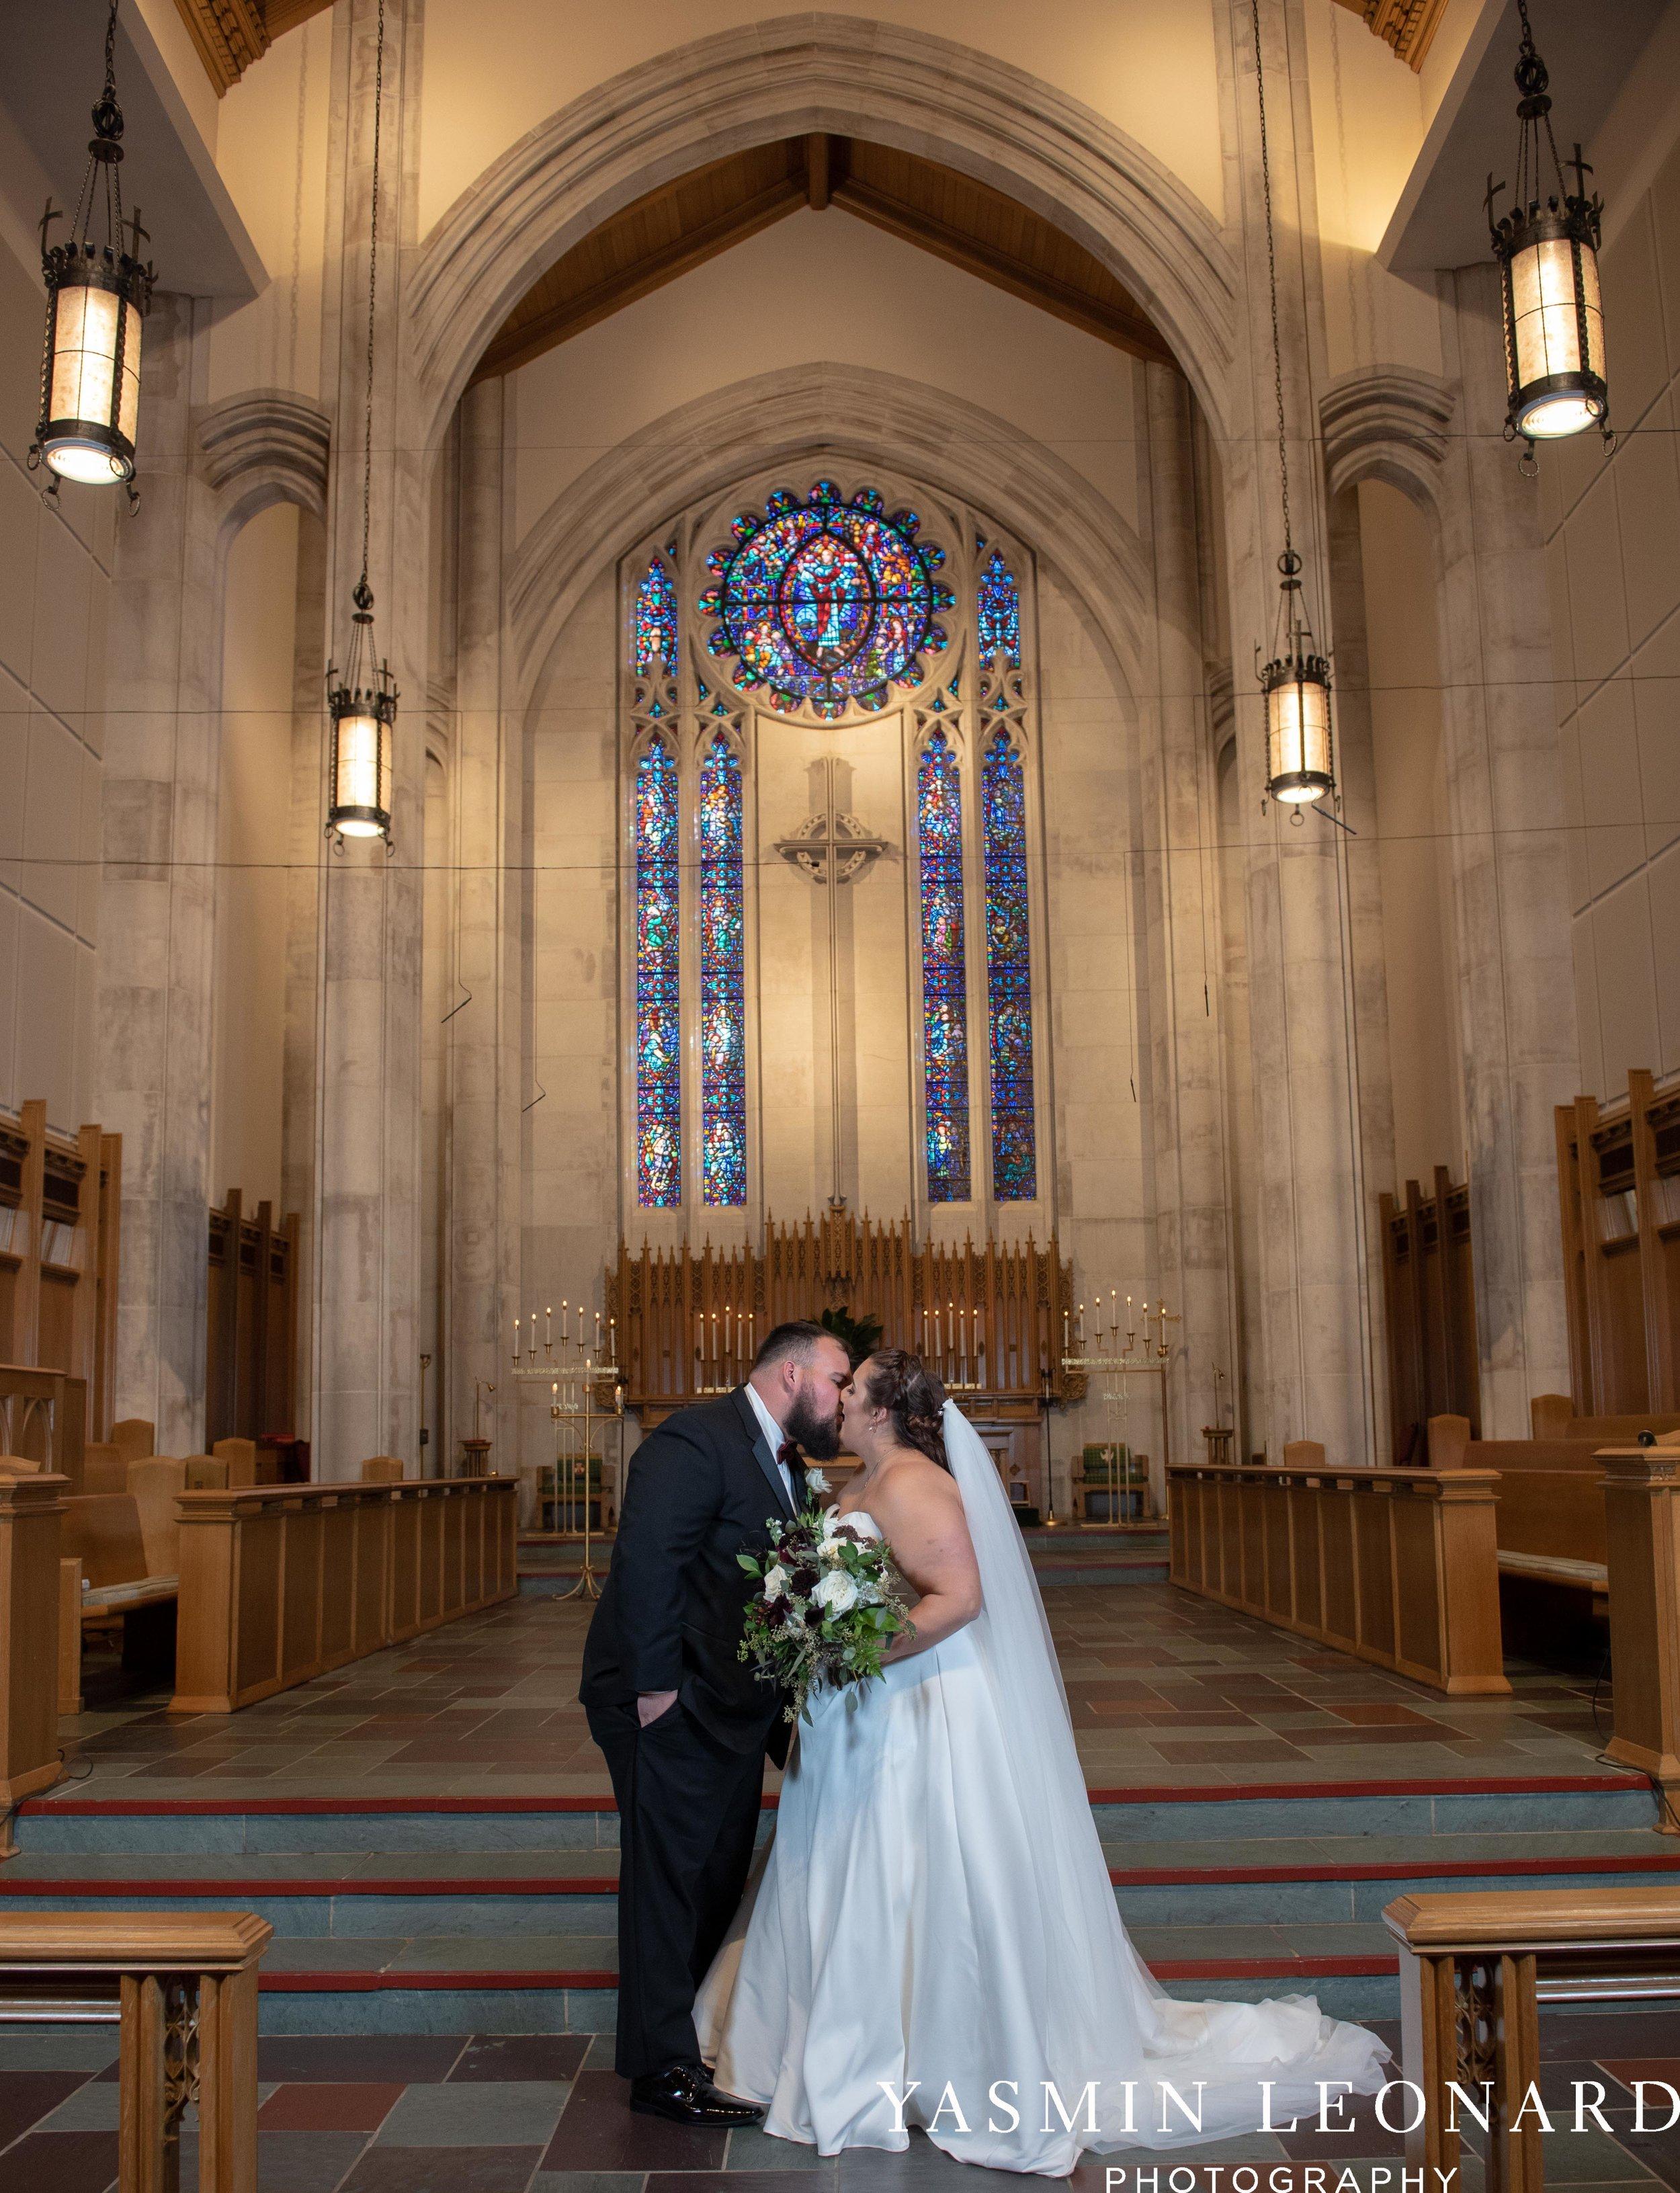 Wesley Memorial United Methodist Church - Old Homeplace Winery - High Point Weddings - High Point Wedding Photographer - NC Weddings - NC Barn Venue - Yasmin Leonard Photography-23.jpg